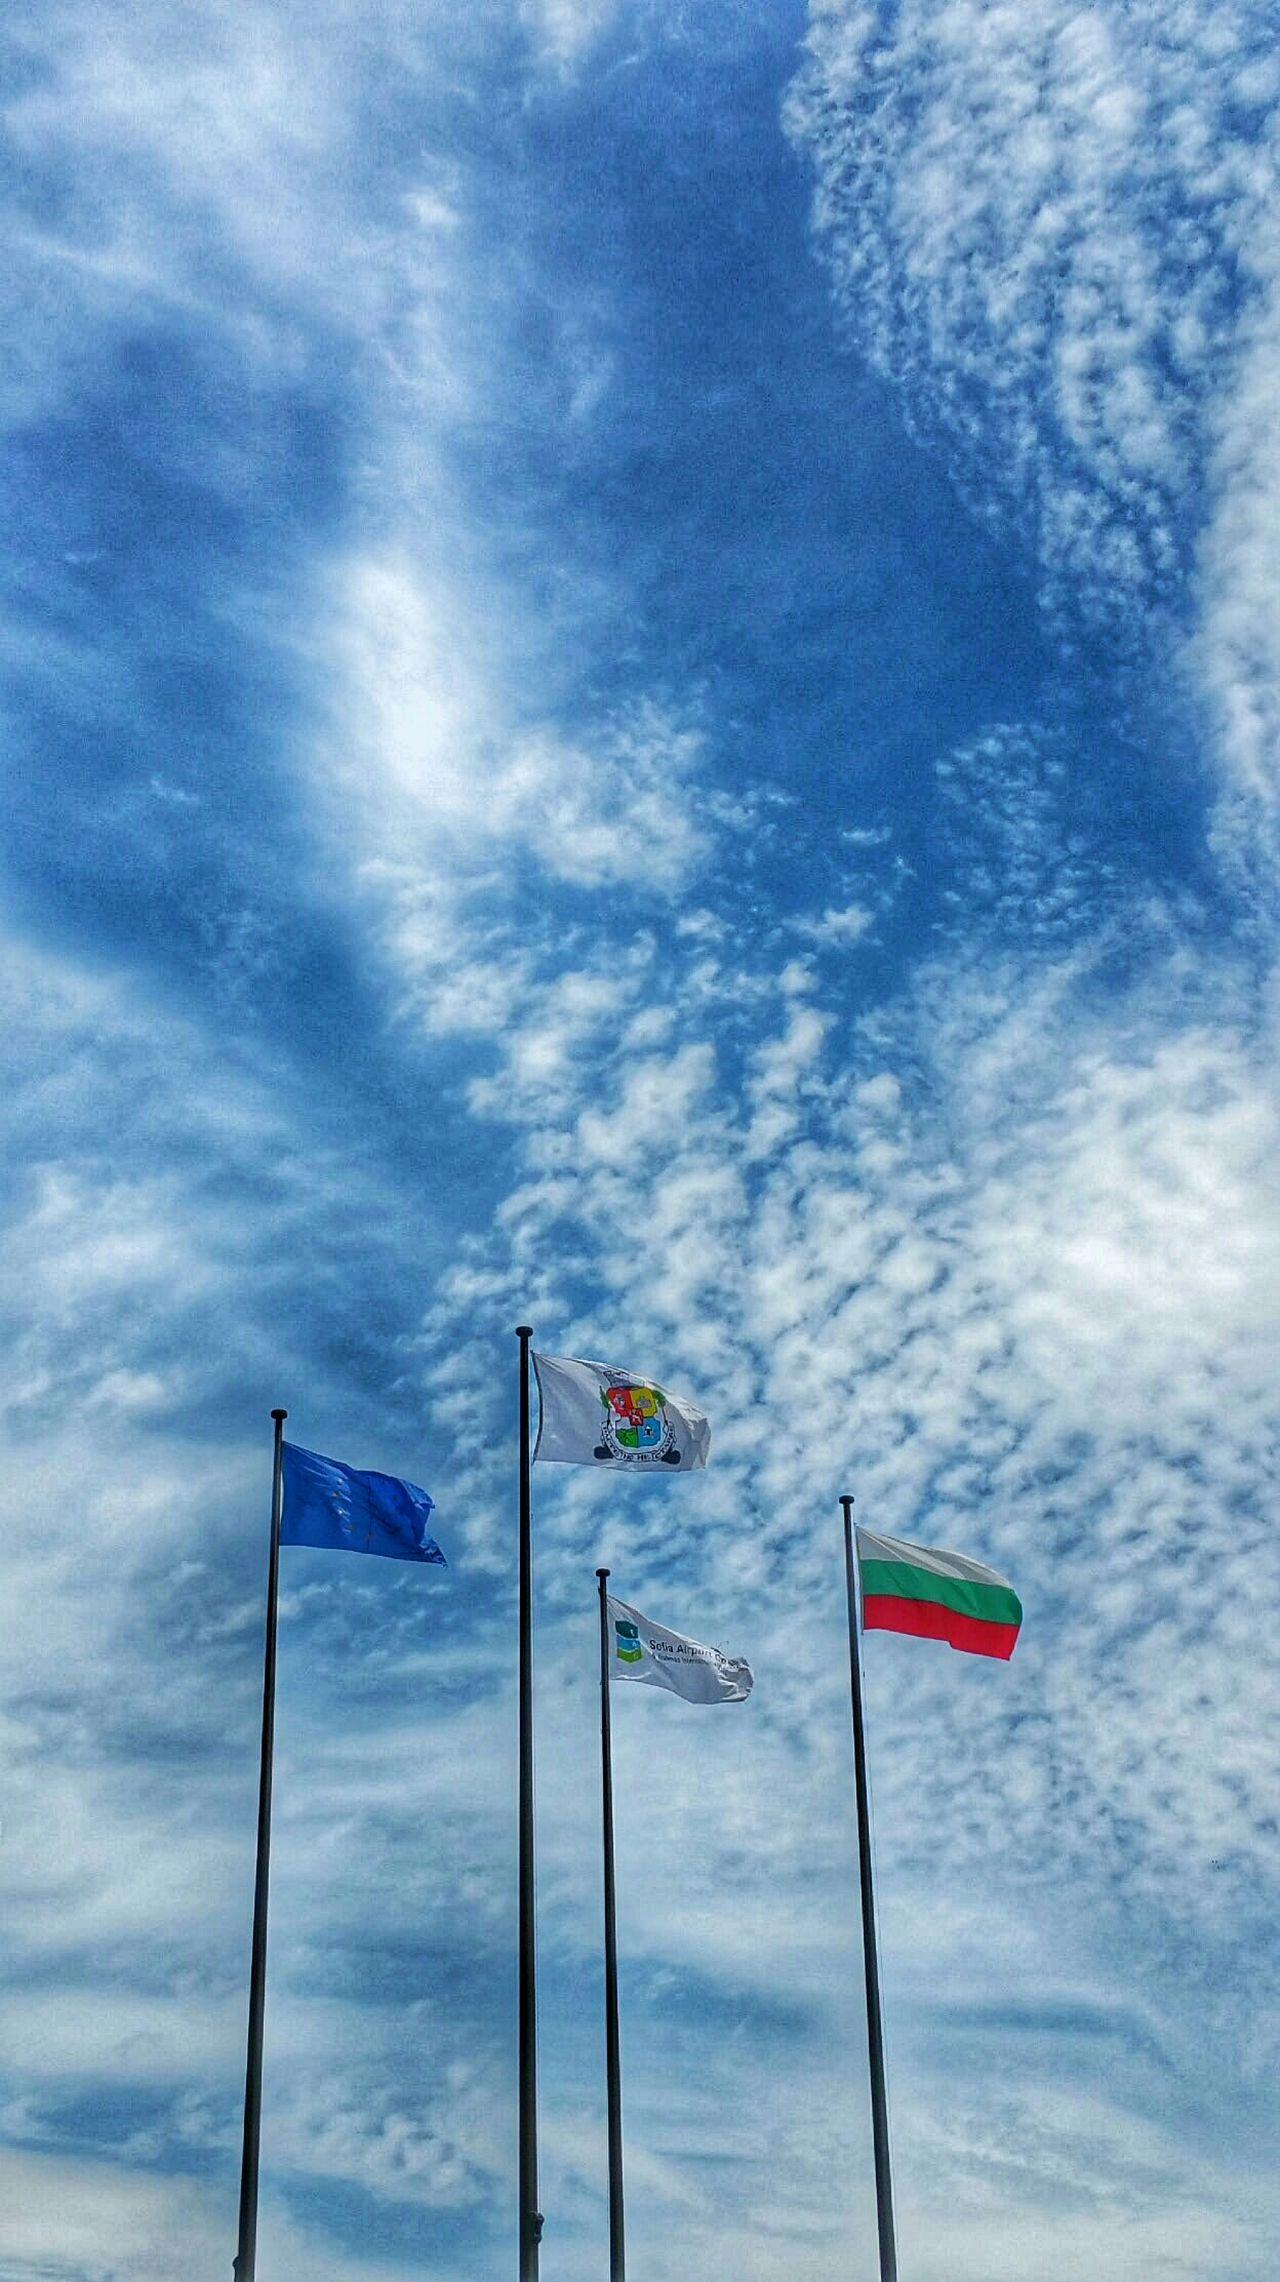 Flags Sofia Europeanunion Bulgaria Sky Bluesky Clouds